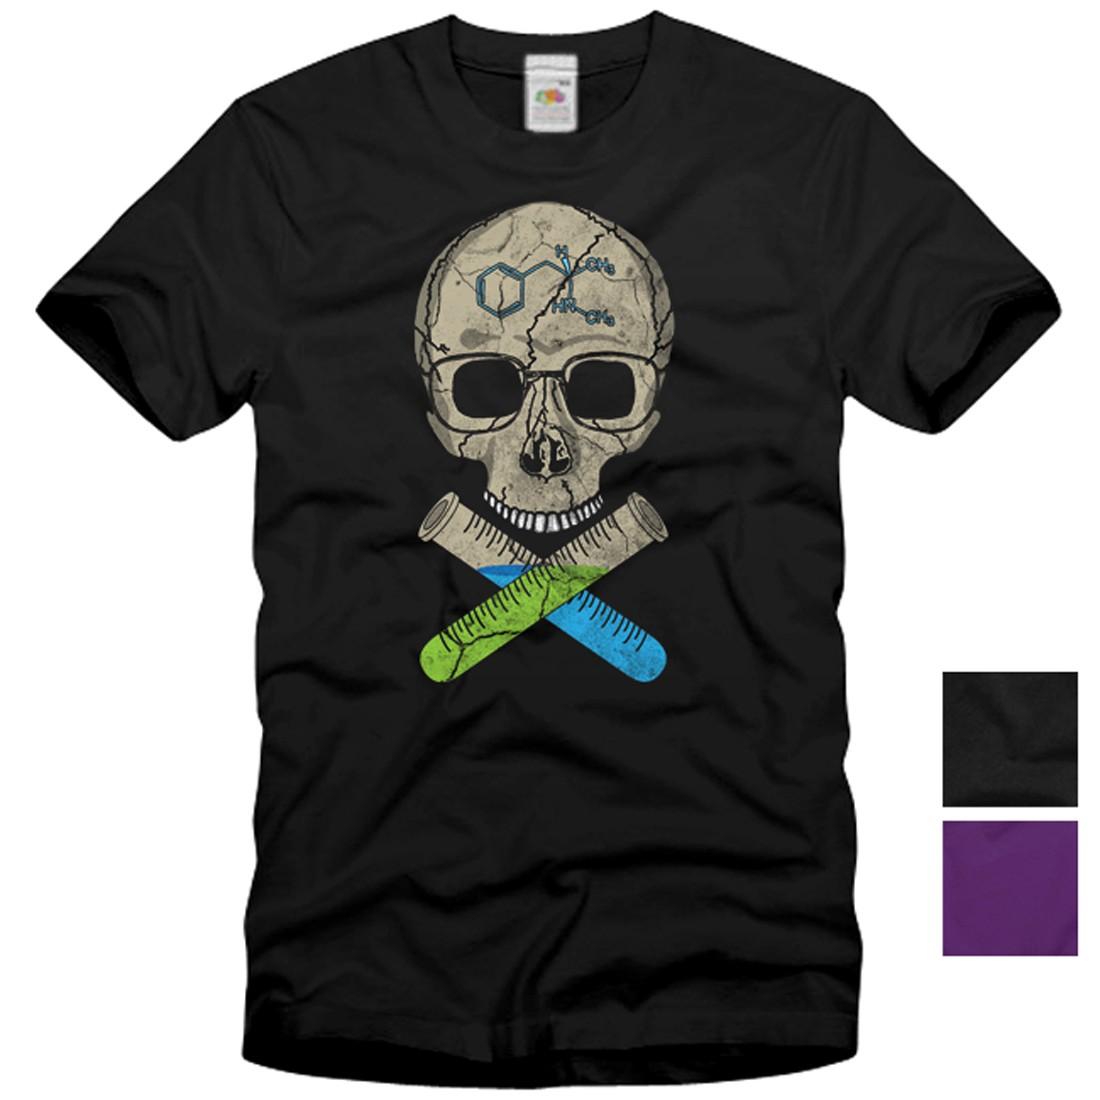 heisenberg totenkopf vintage t shirt herren breaking bad skull serie tv bones ebay. Black Bedroom Furniture Sets. Home Design Ideas